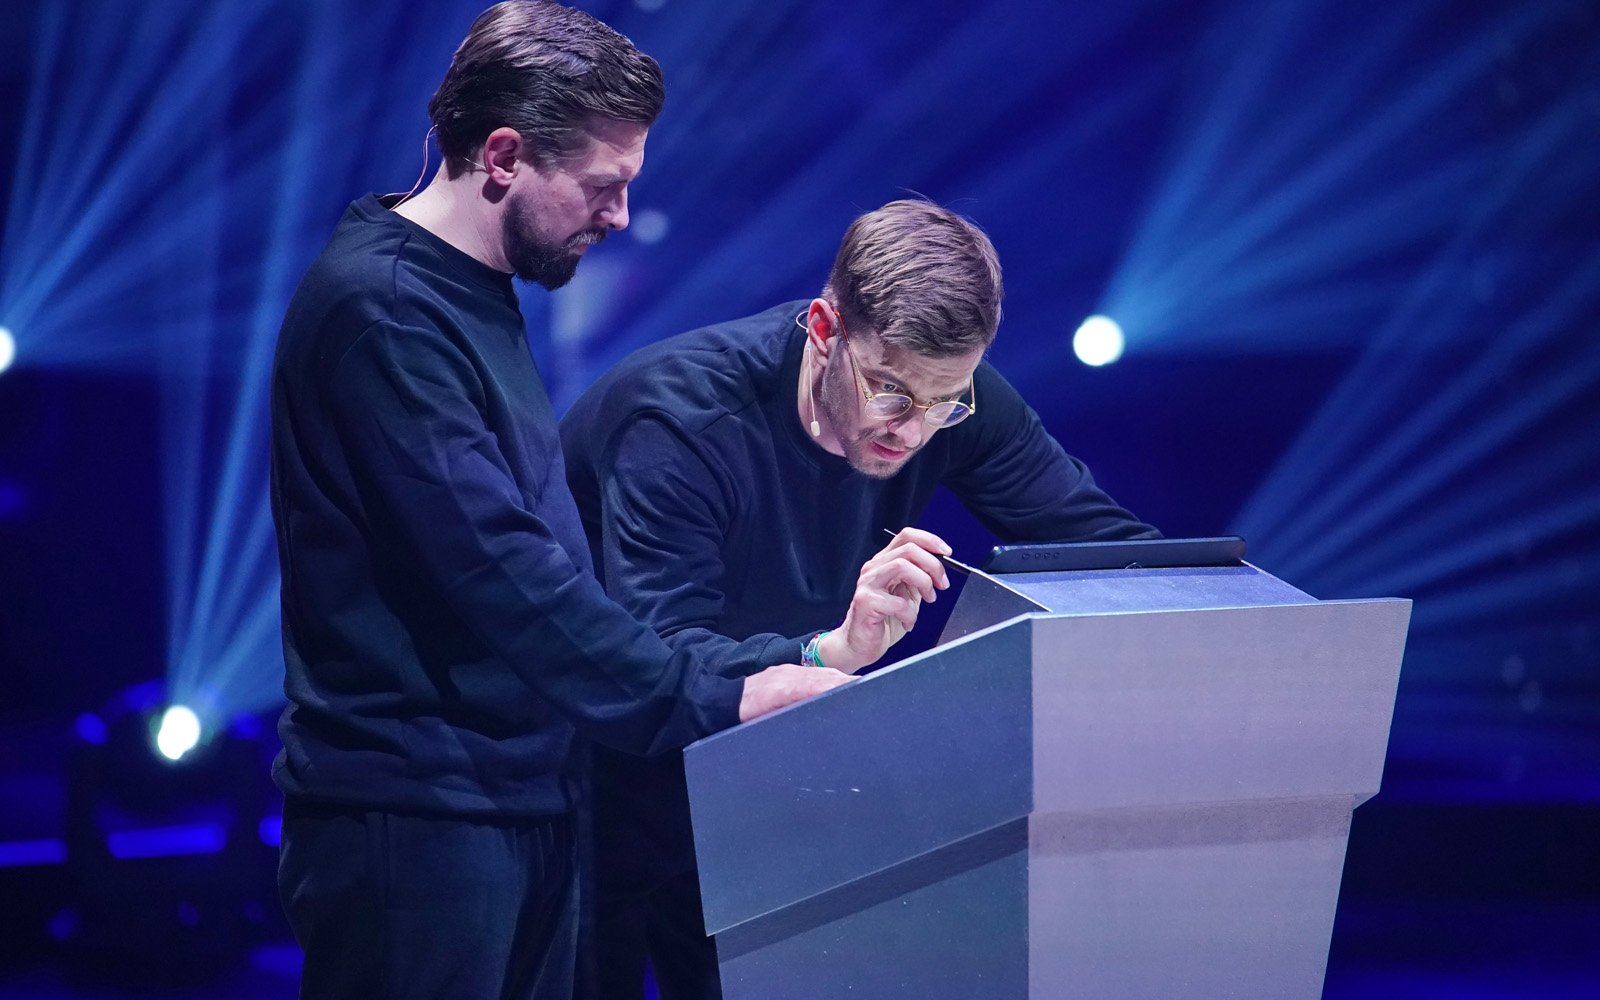 Joko Klaas Gegen Prosieben Unfaires Finalspiel Zuschauer Sauer Tv Digital